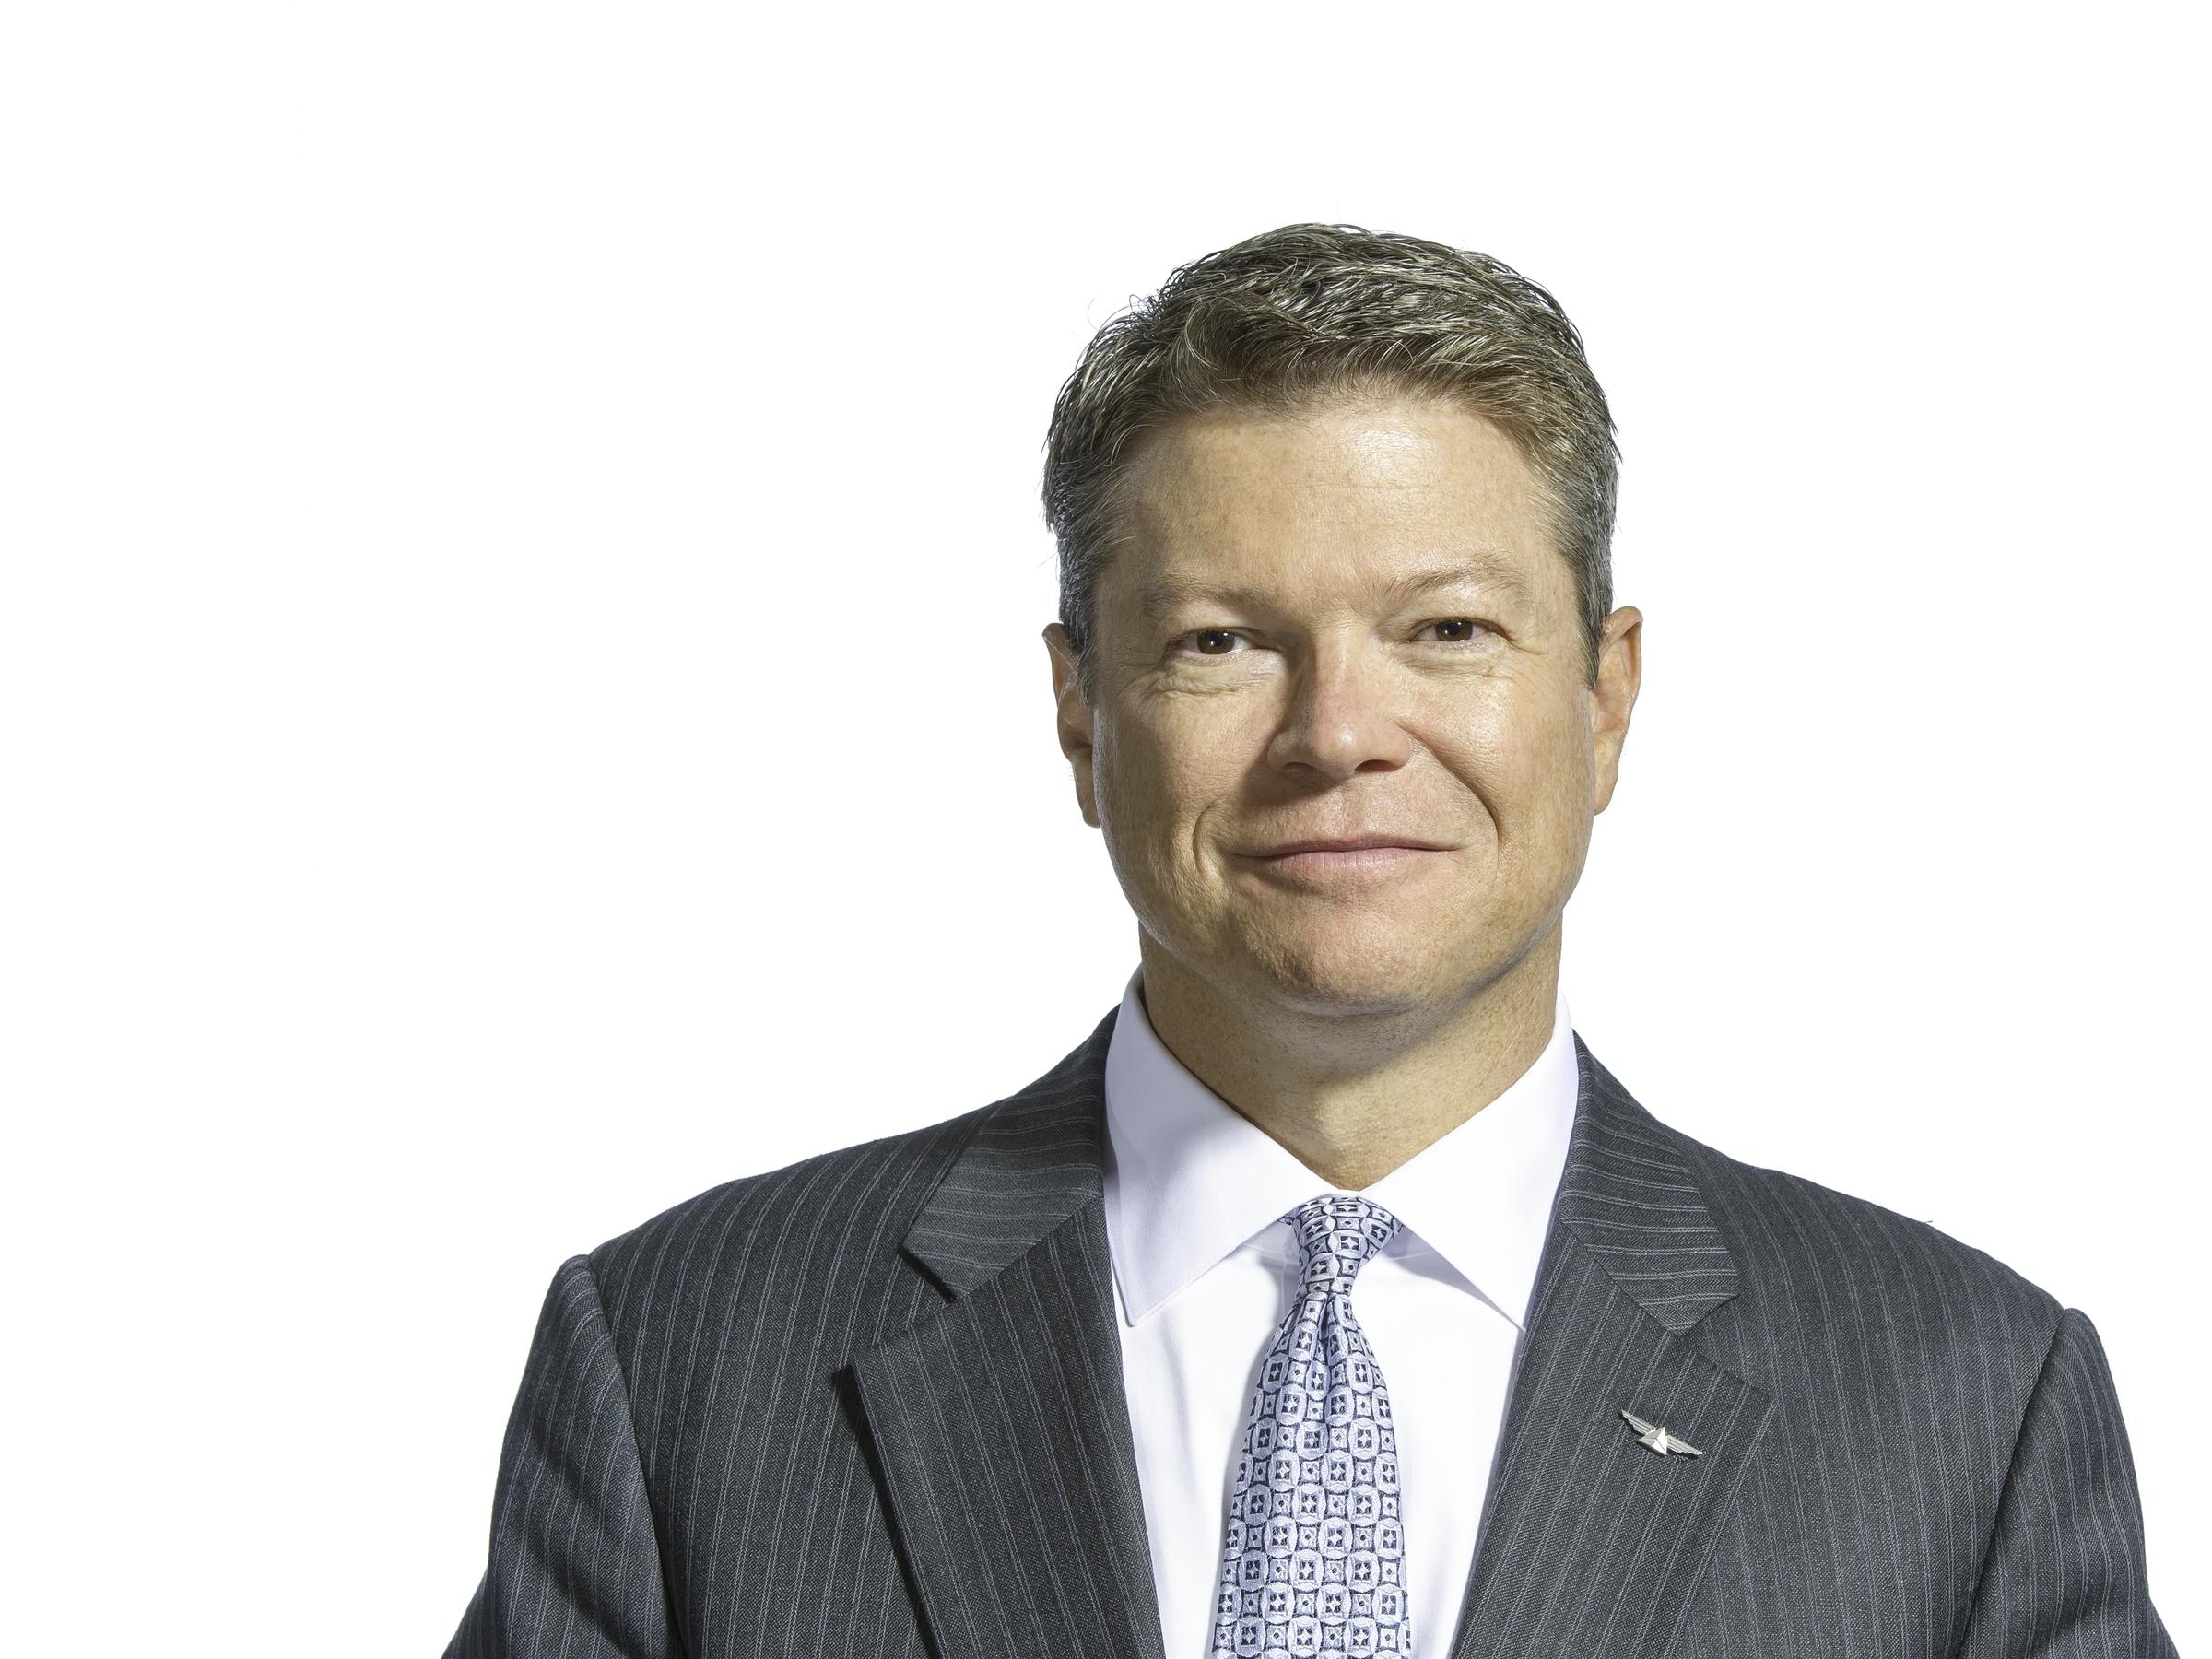 Tim Mapes Executive Headshot